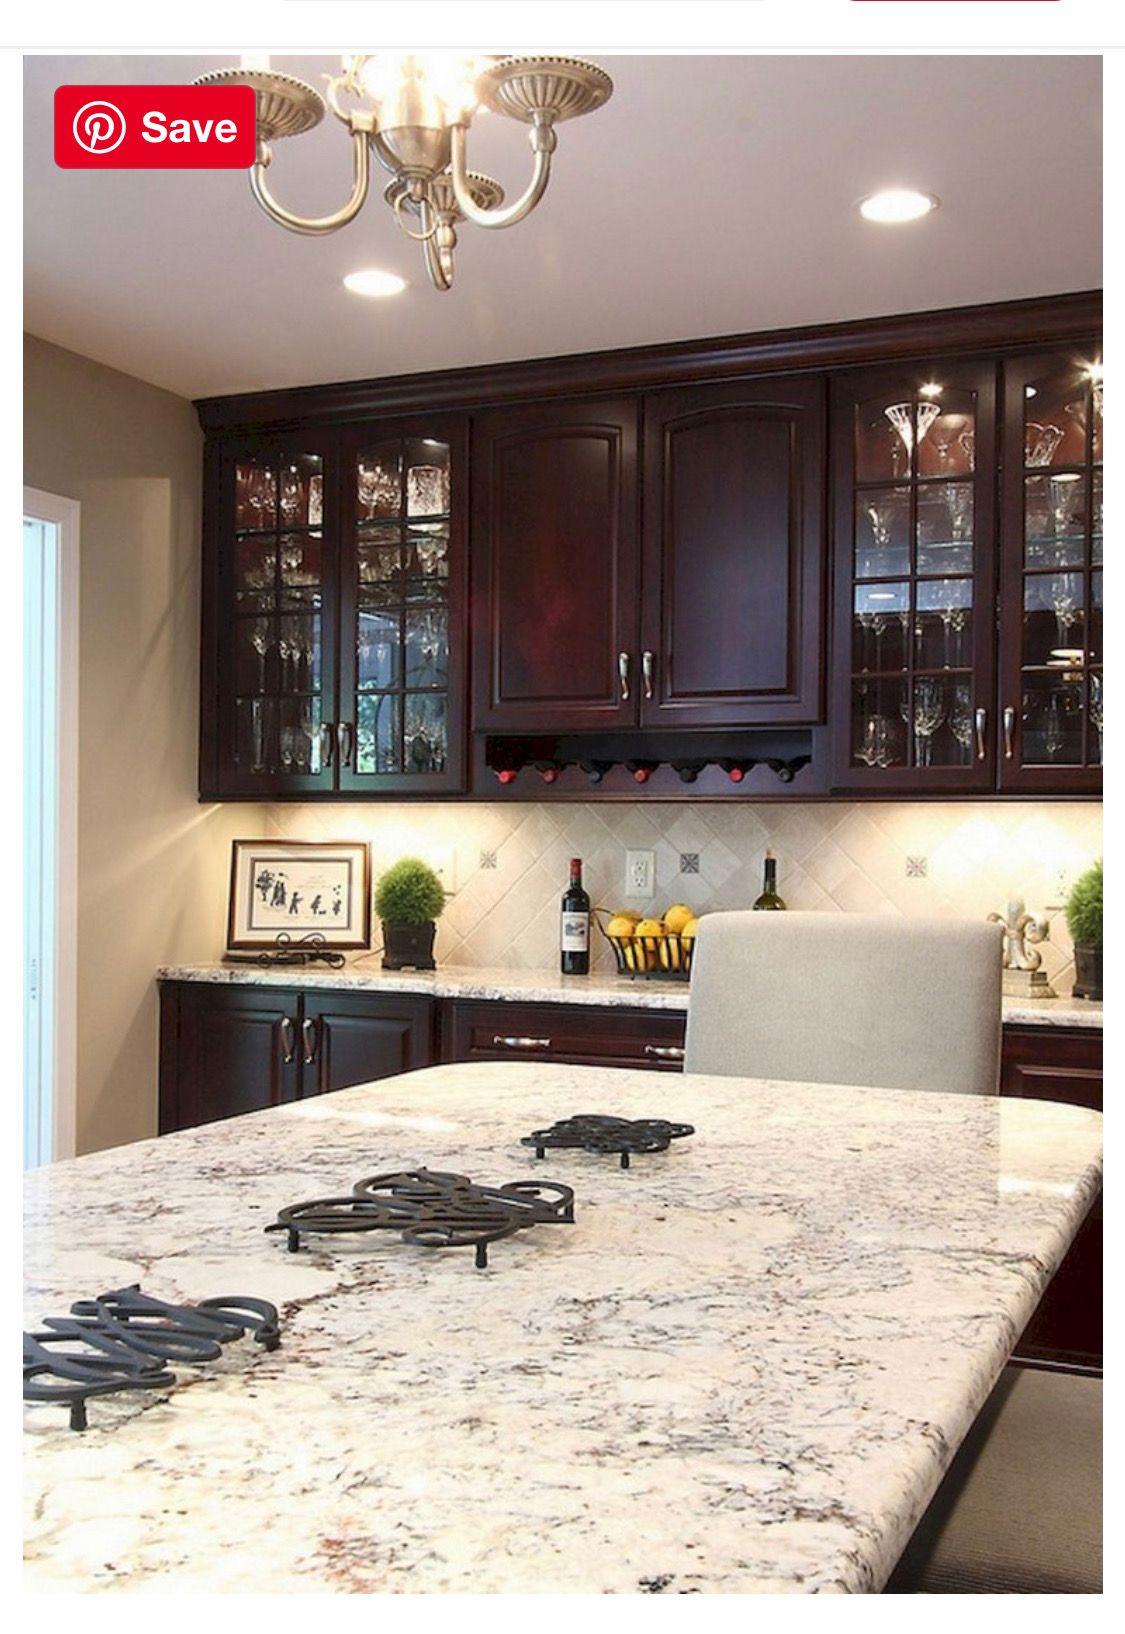 pinangie michel on new house  kitchen  backsplash